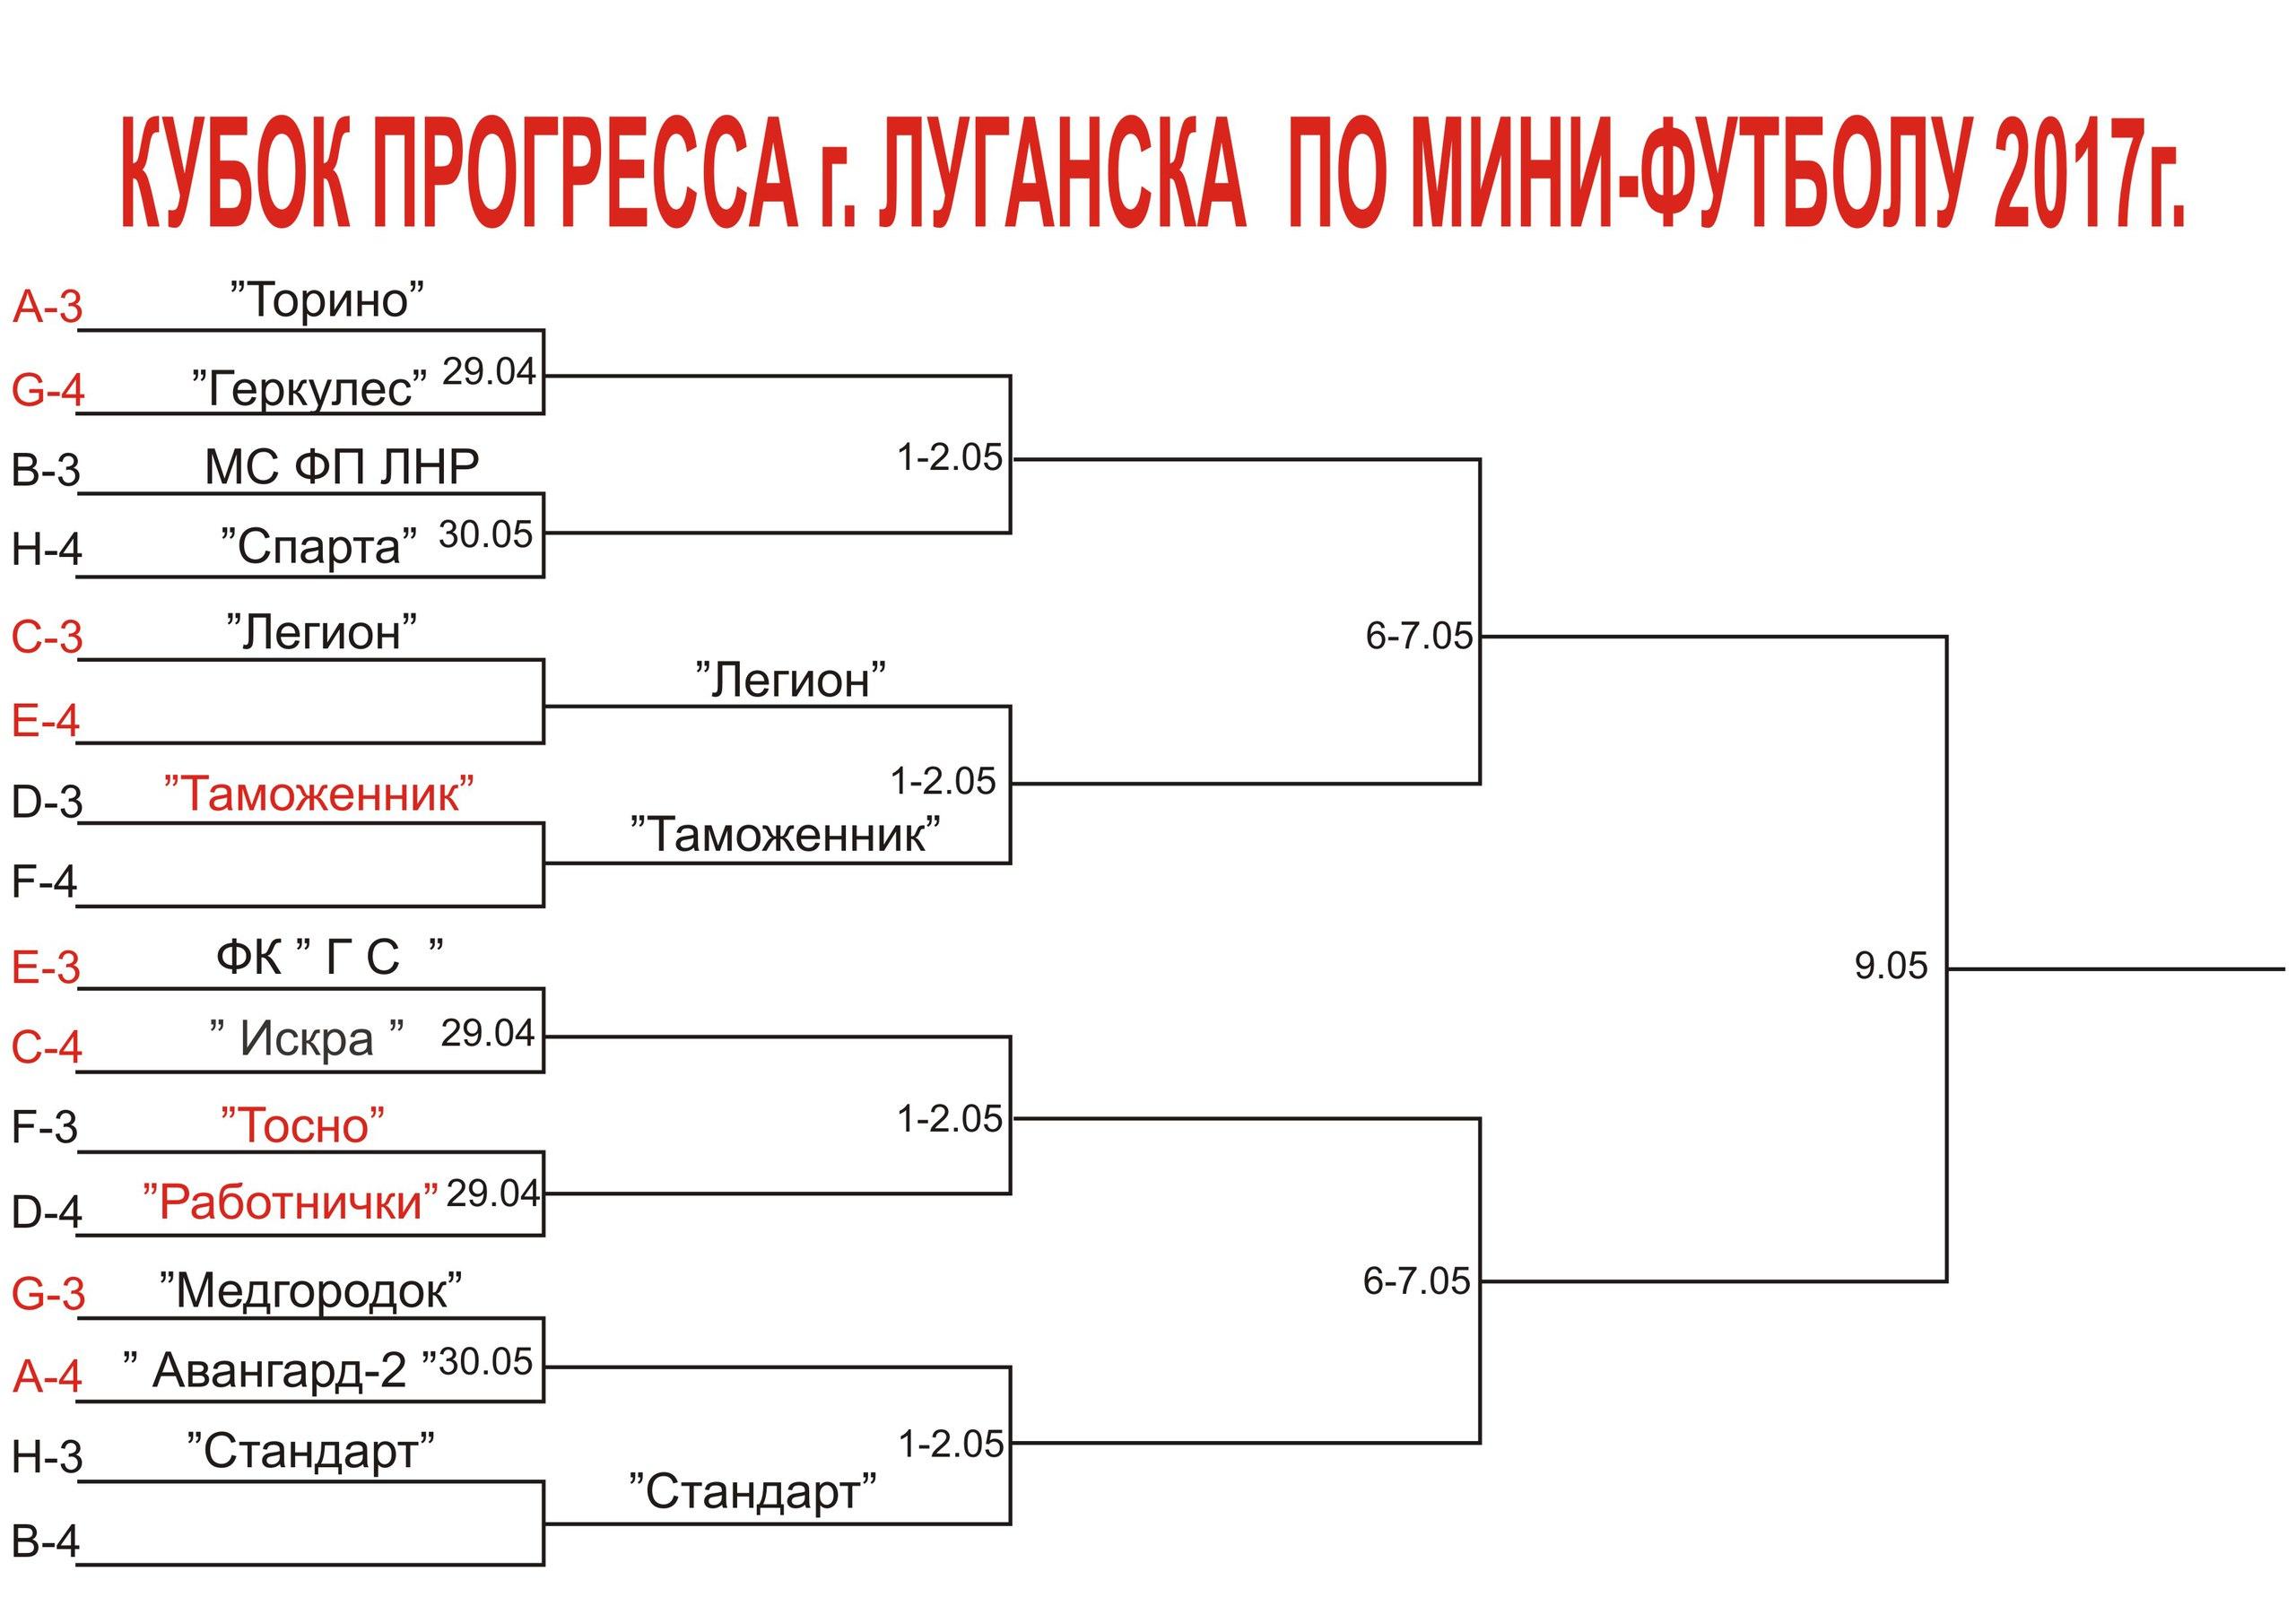 Кубок Лиги г.Луганска по мини-футболу